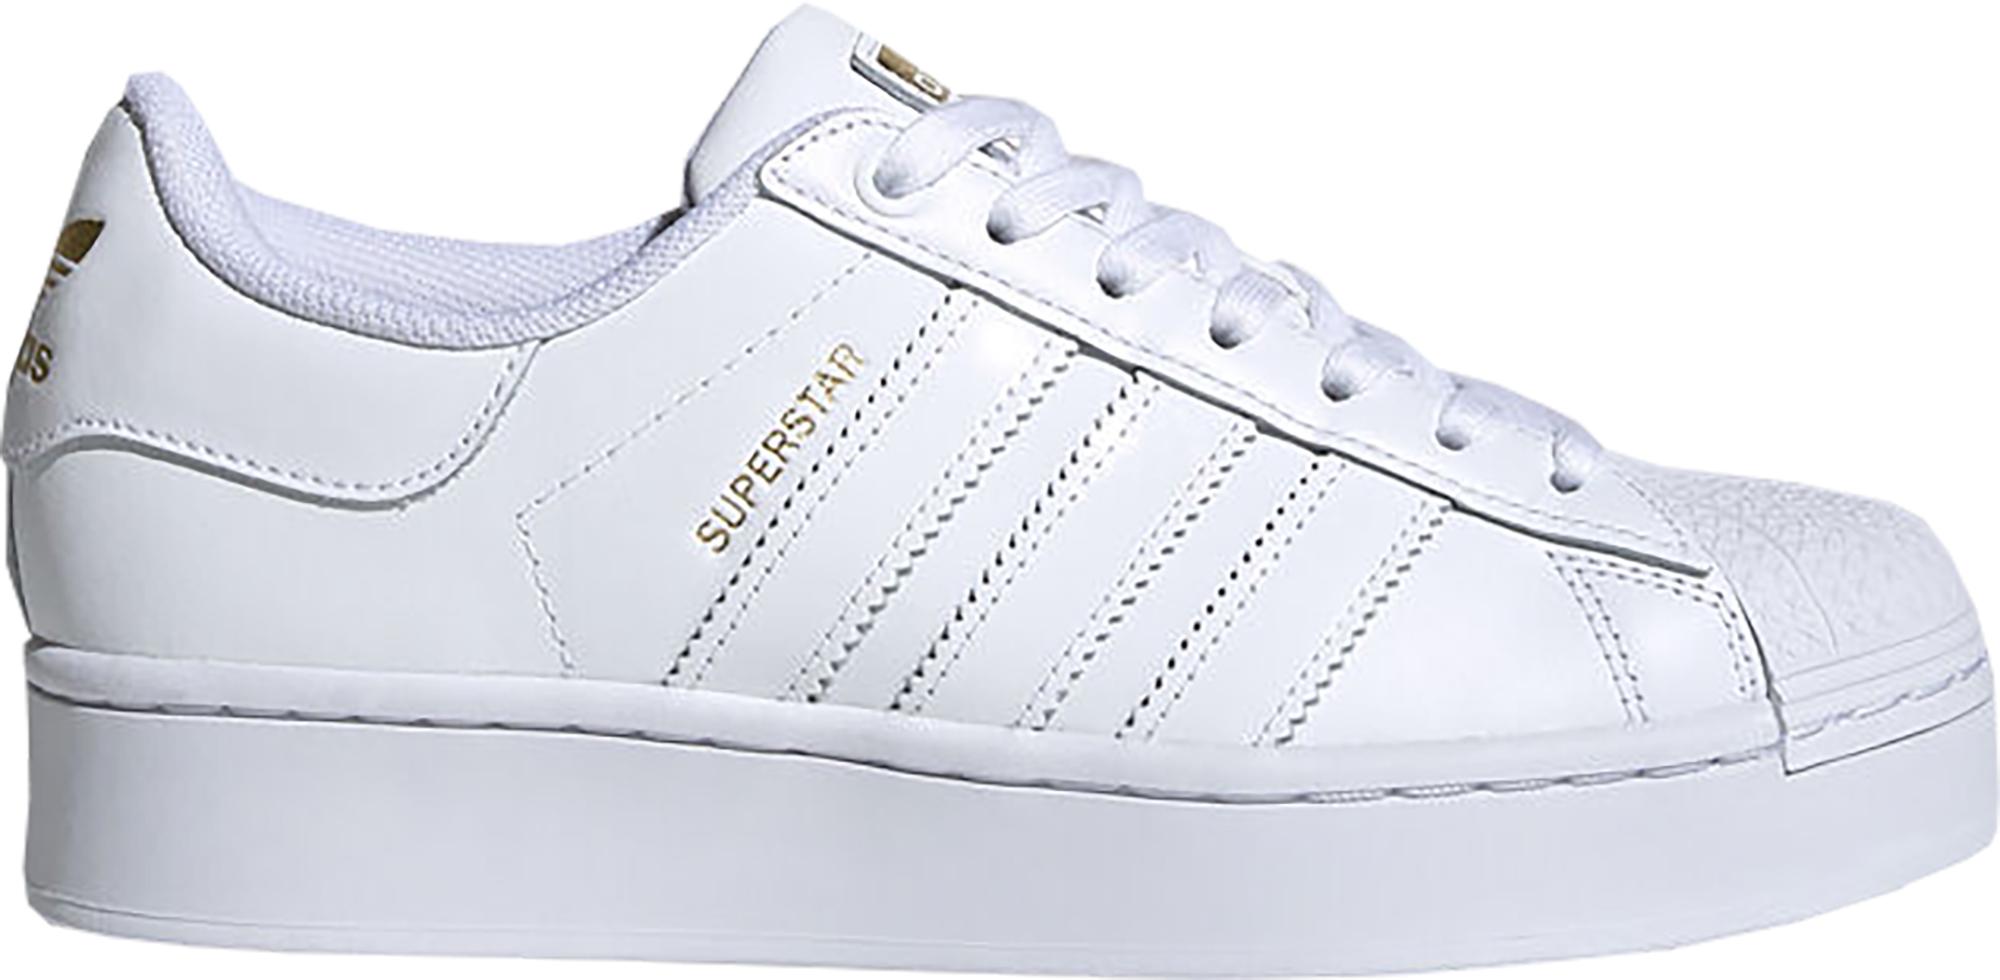 adidas Superstar Bold White (W) - FV3334